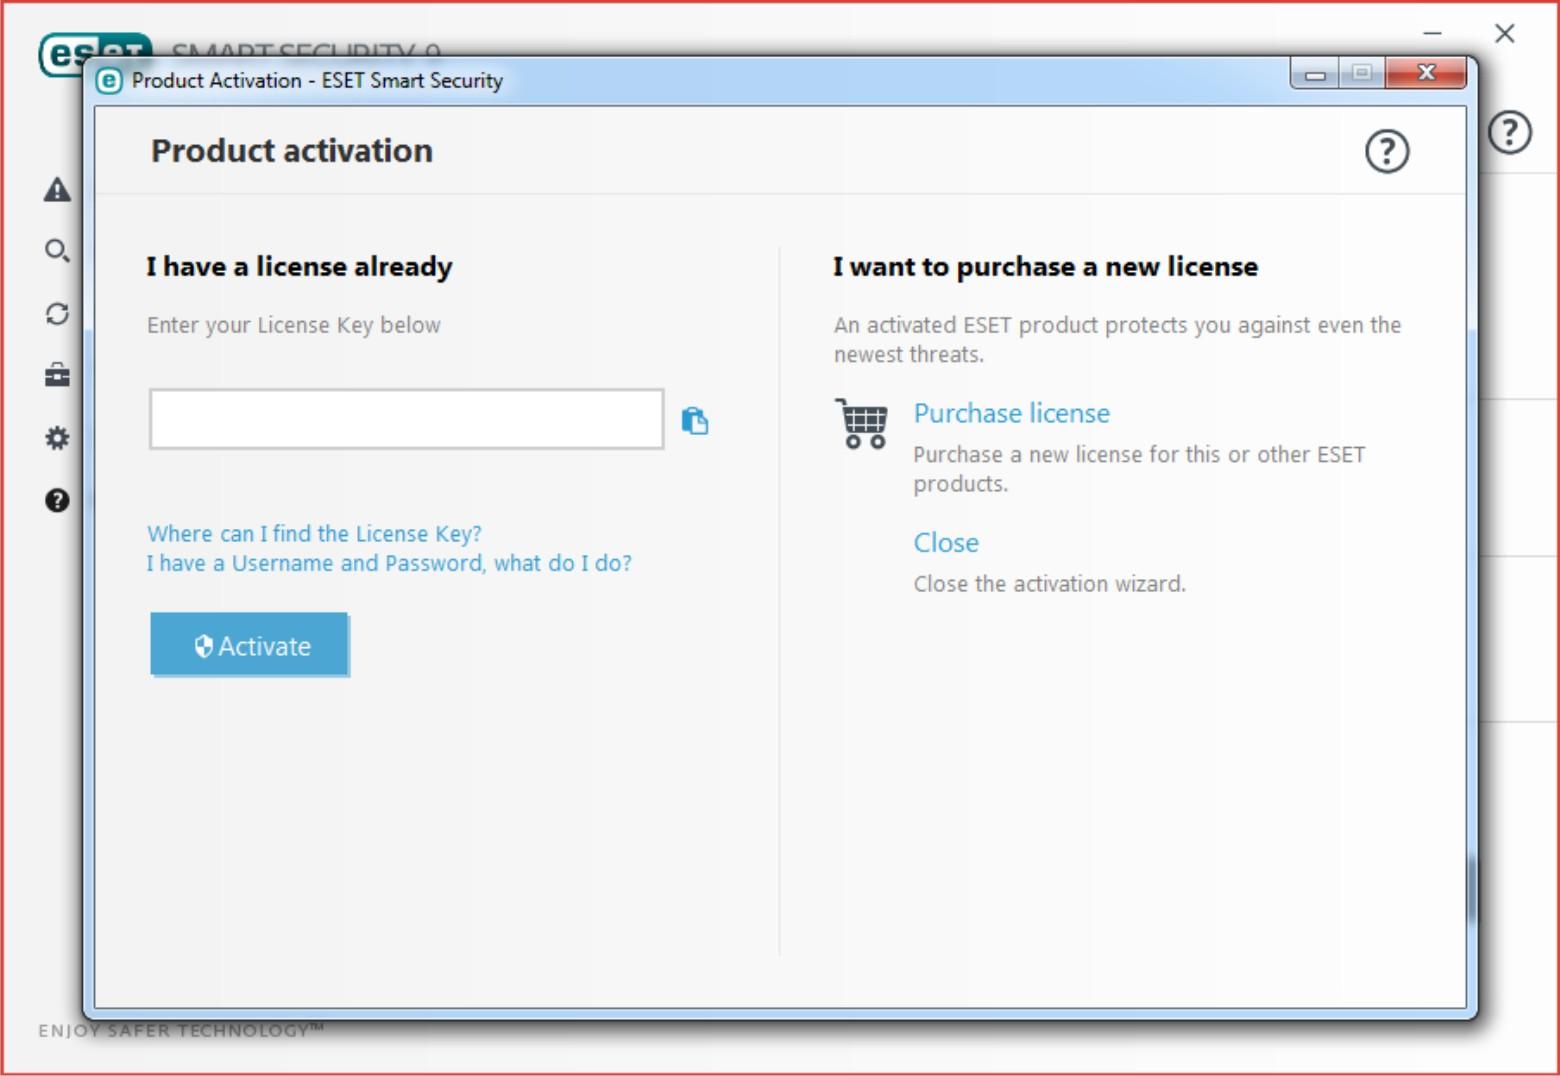 nod32 antivirus 10 license key 2017 free download